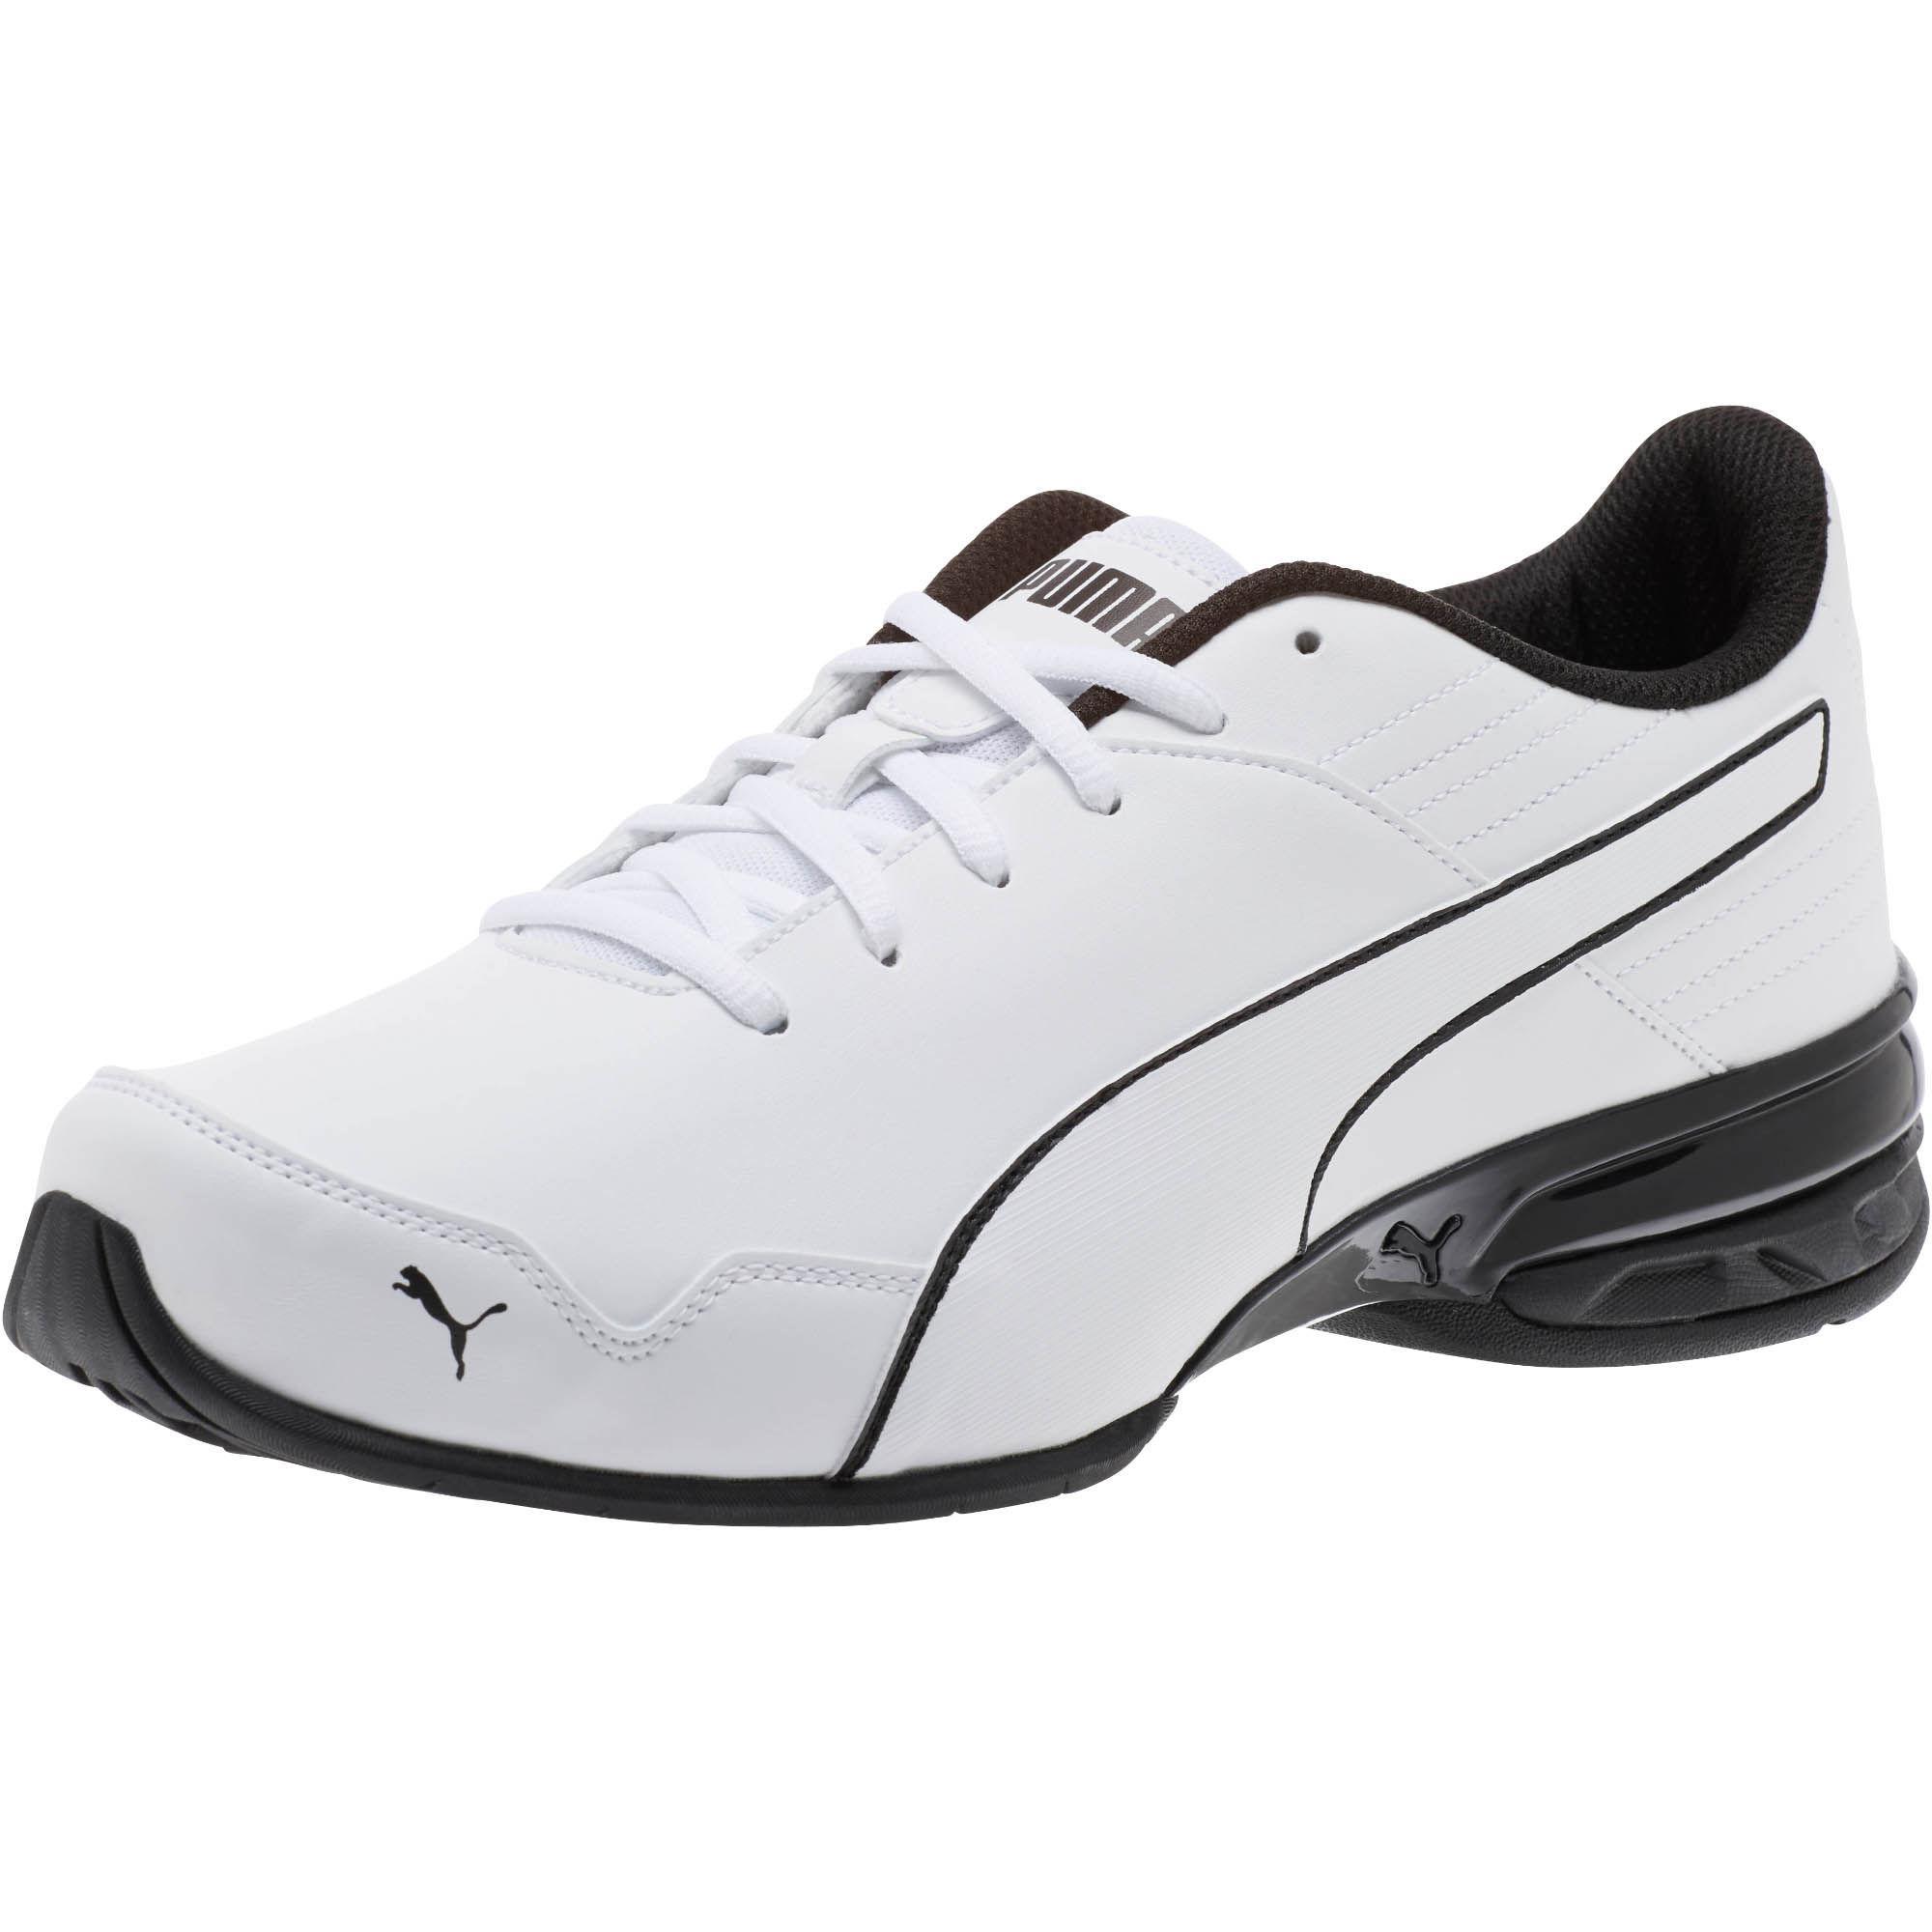 PUMA. White Super Levitate Men s Running Shoes ed47c1ce3